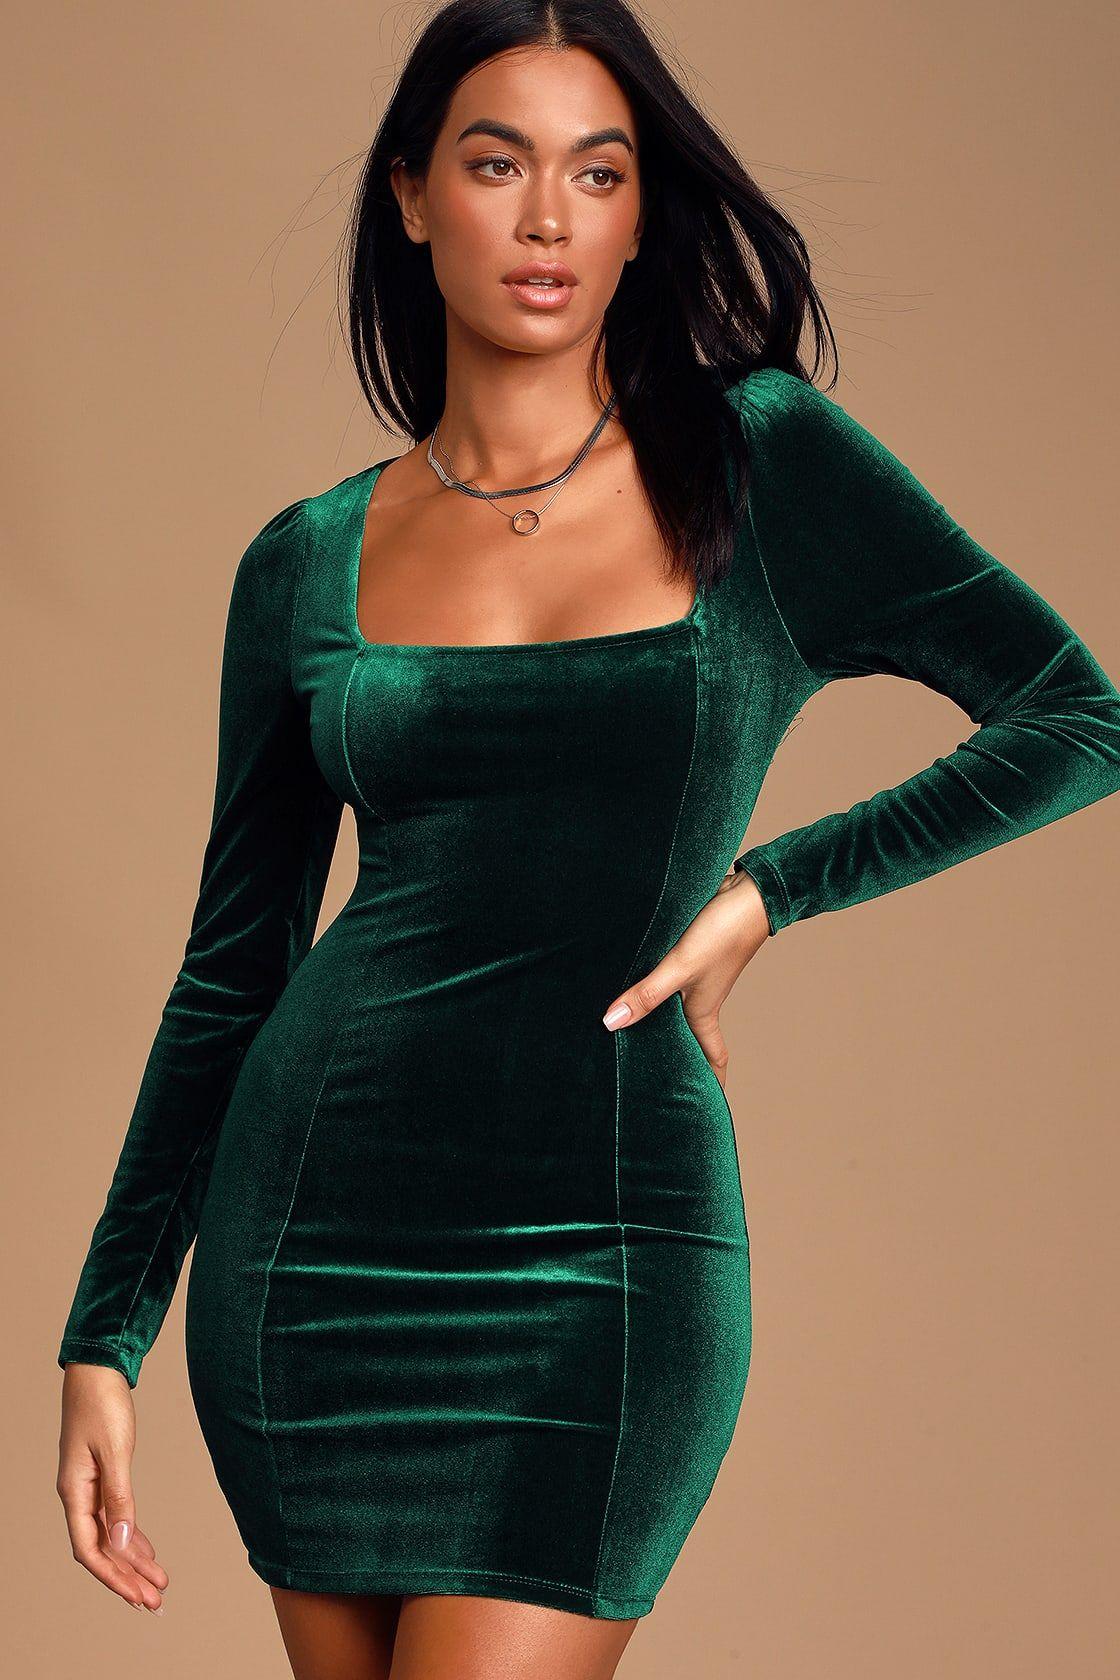 Ansonia Emerald Green Velvet Long Sleeve Bodycon Dress Long Sleeve Bodycon Bodycon Dress Green Velvet Dress [ 1680 x 1120 Pixel ]